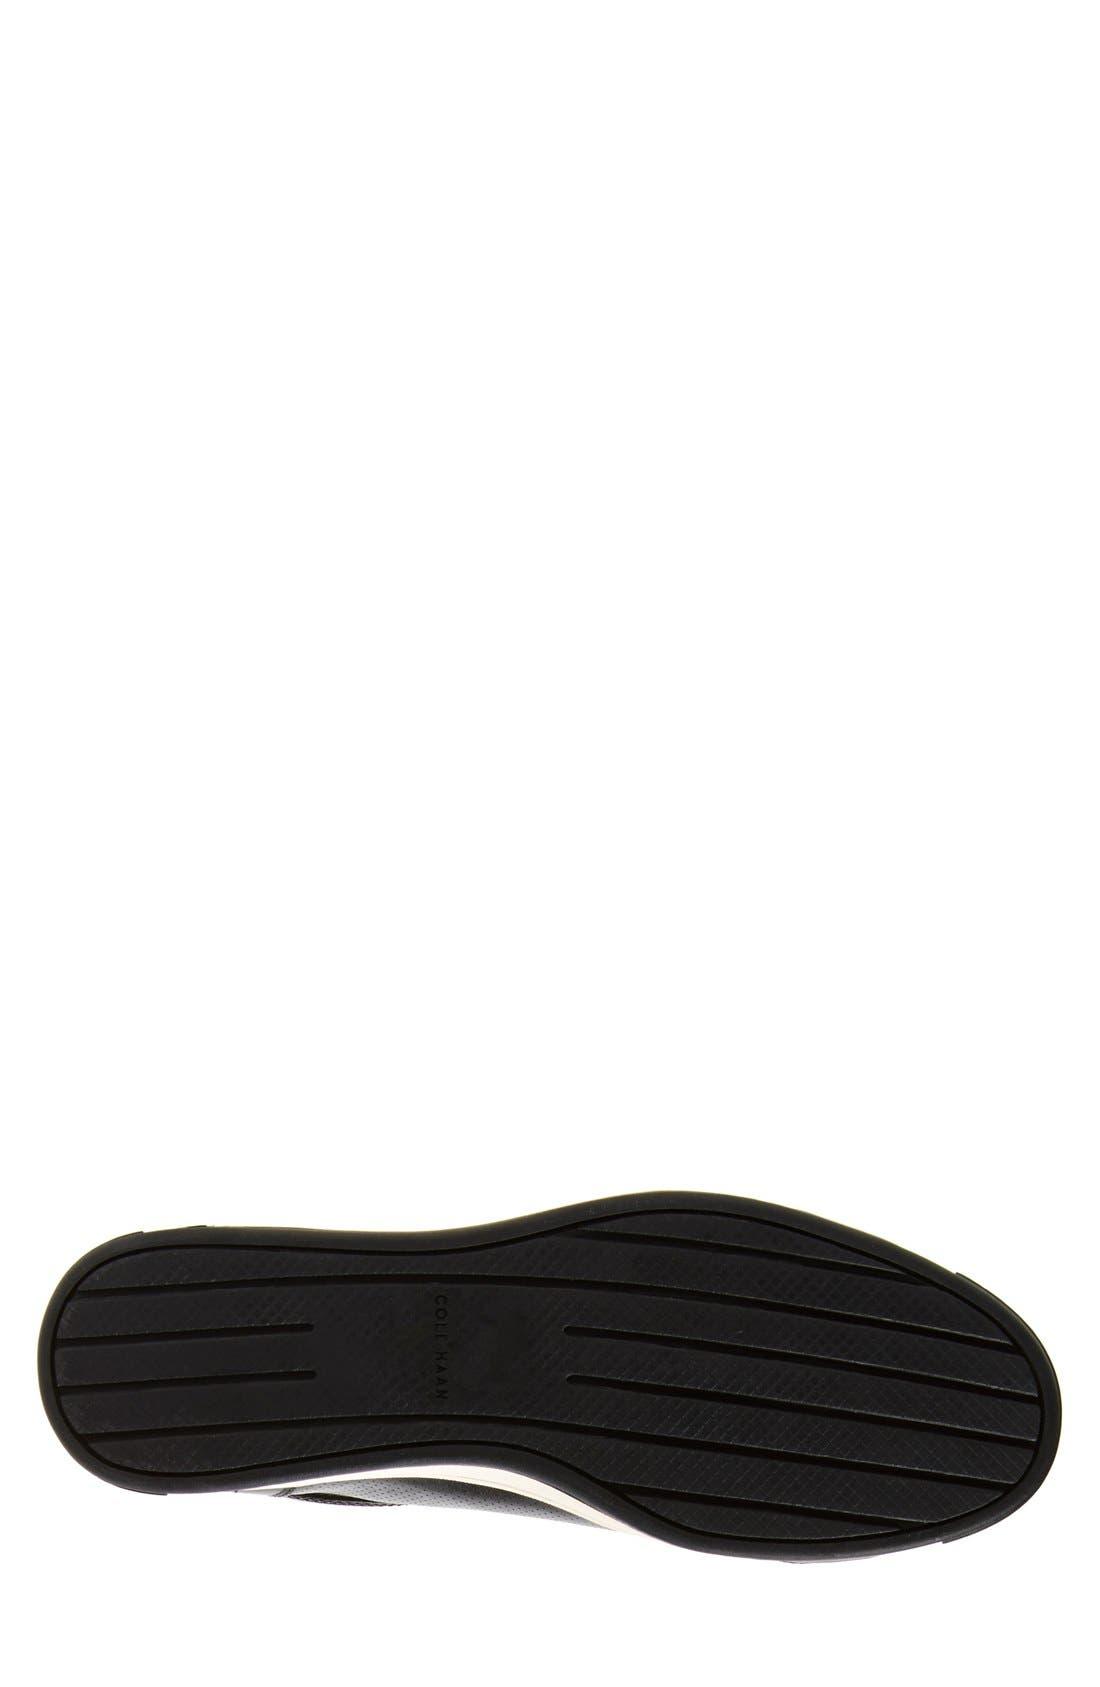 'Vartan Sport Oxford' Sneaker,                             Alternate thumbnail 47, color,